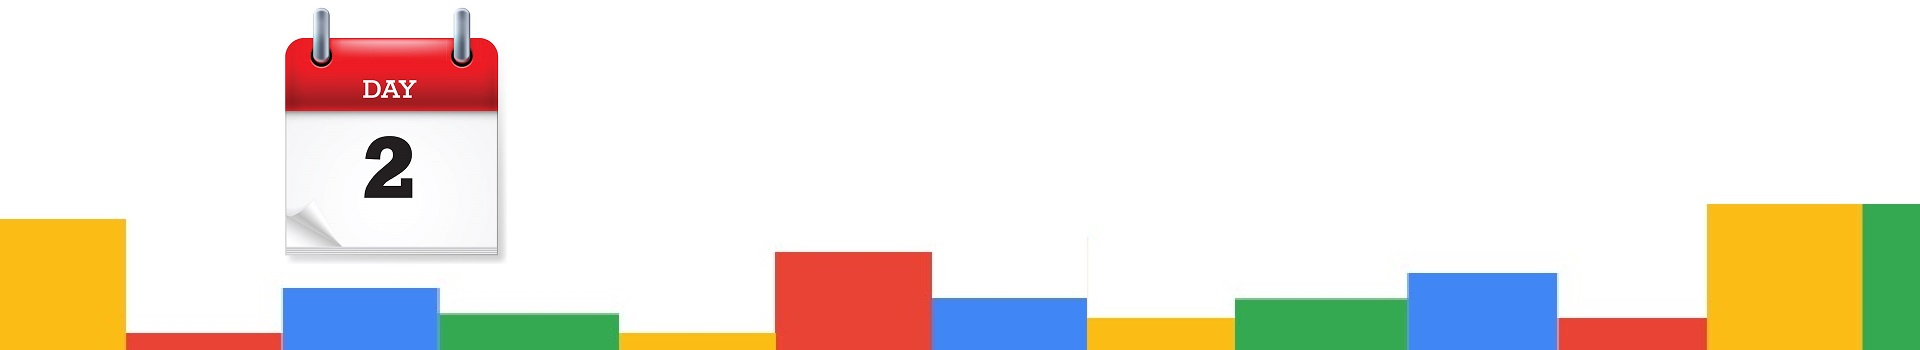 Google Day 2